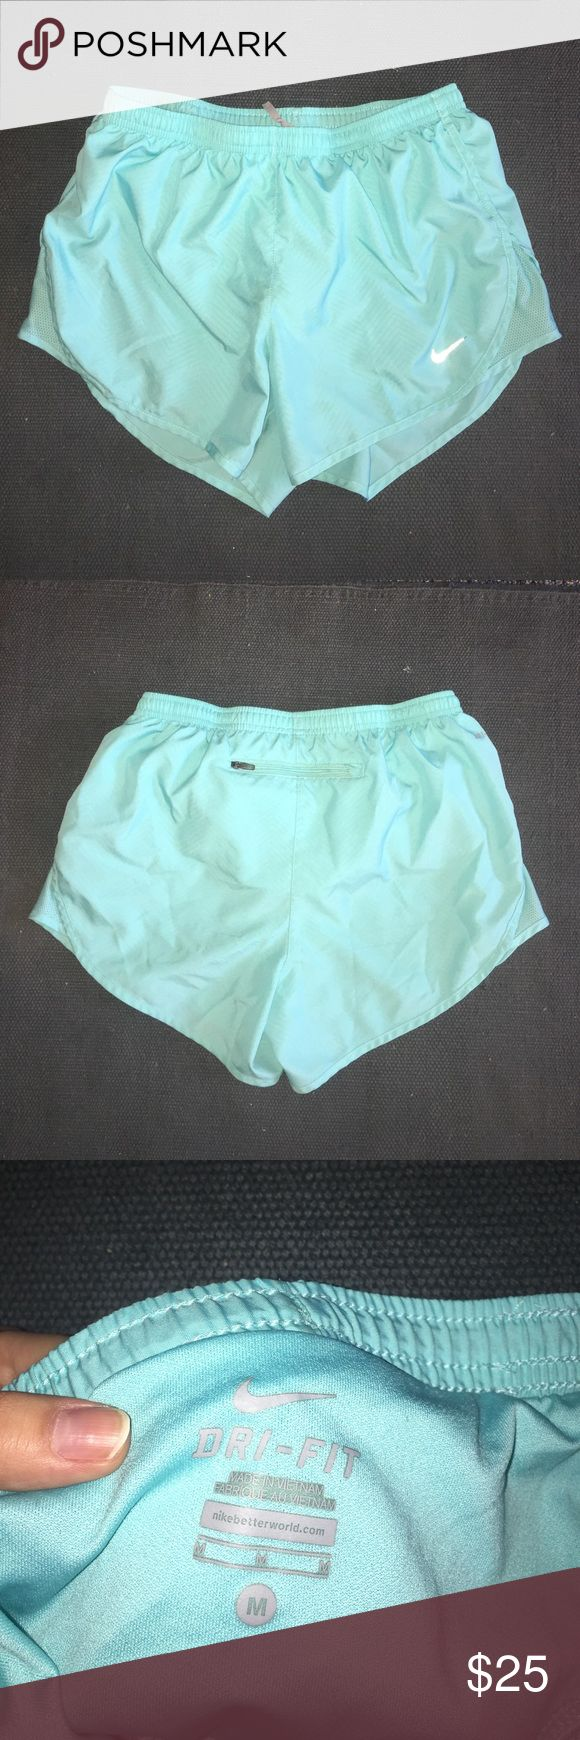 Nike shorts neon green Great condition! Has a back pocket. Nike Shorts